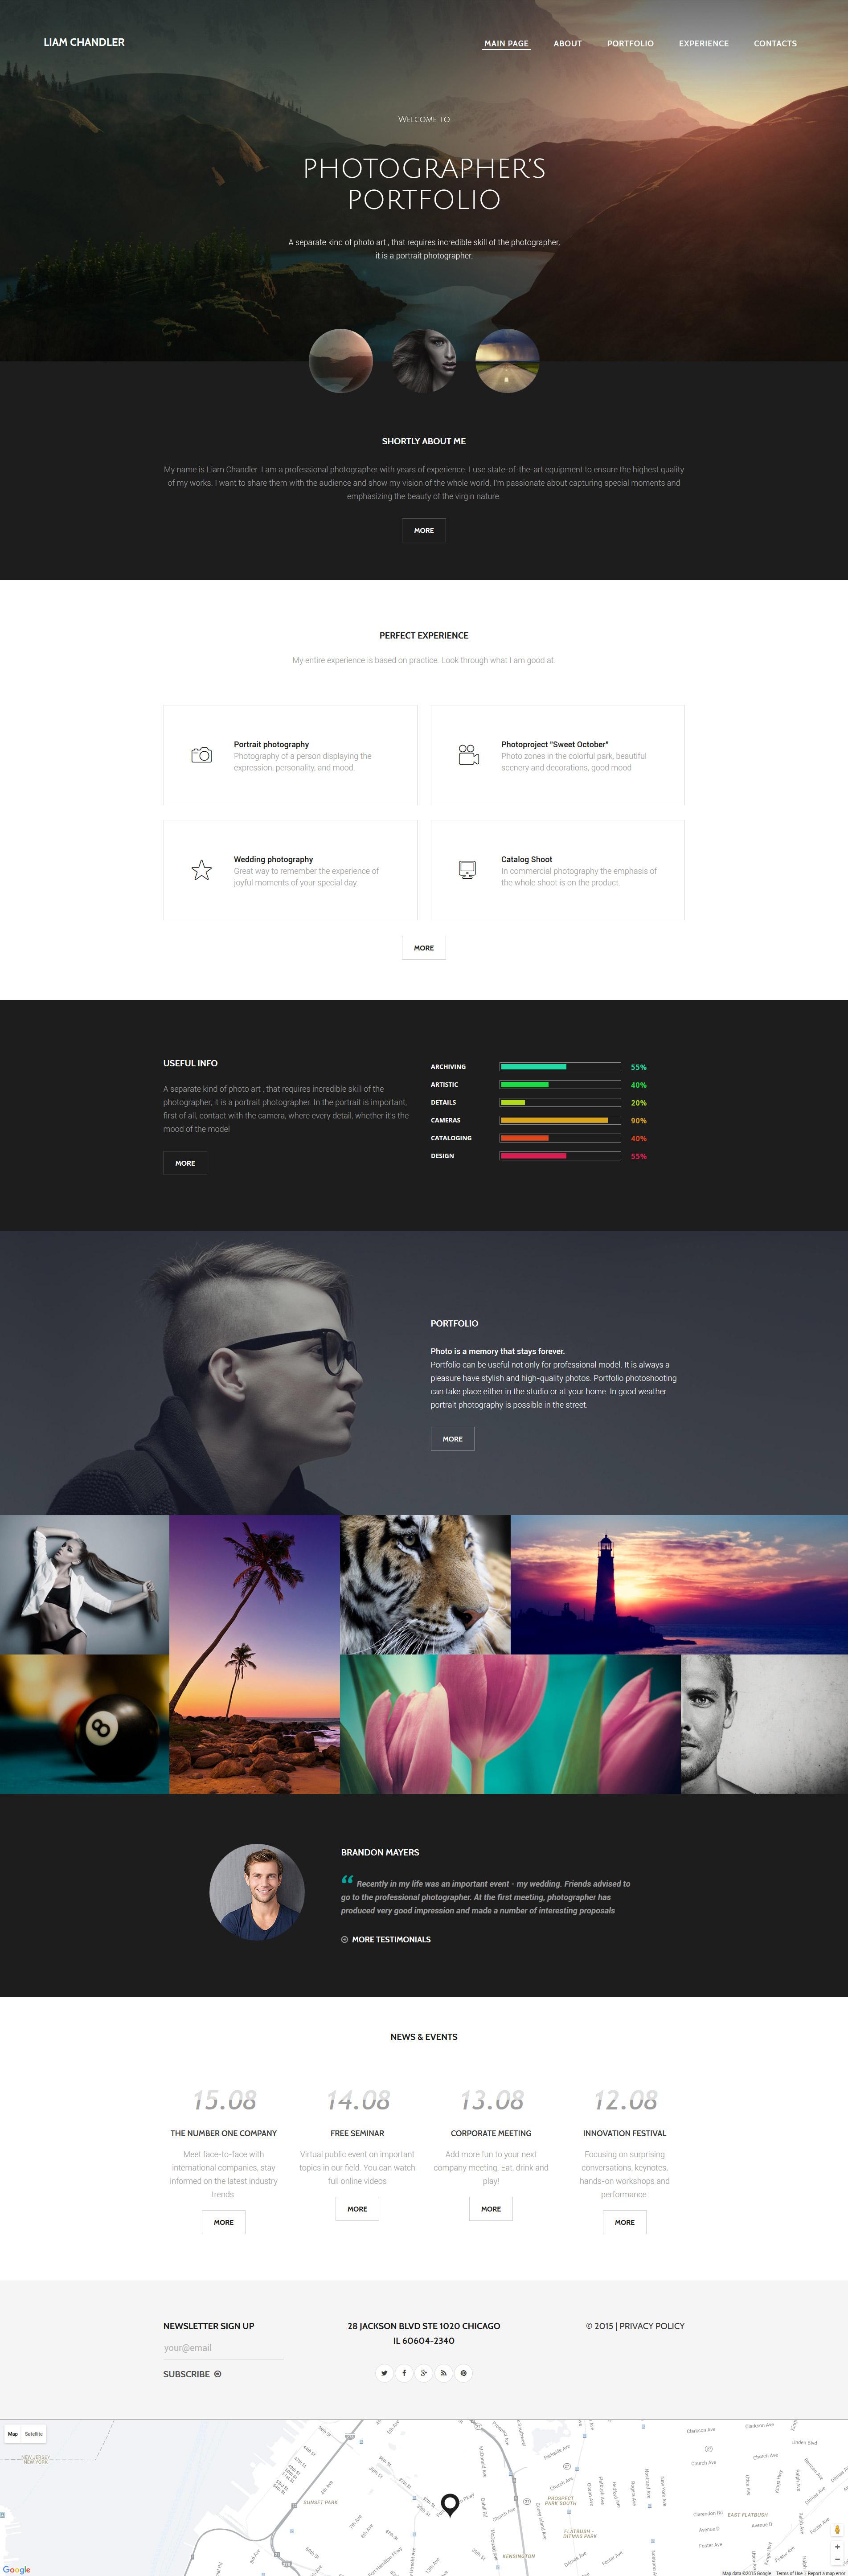 """Photographer Portfolio"" - адаптивний Шаблон сайту №57646"